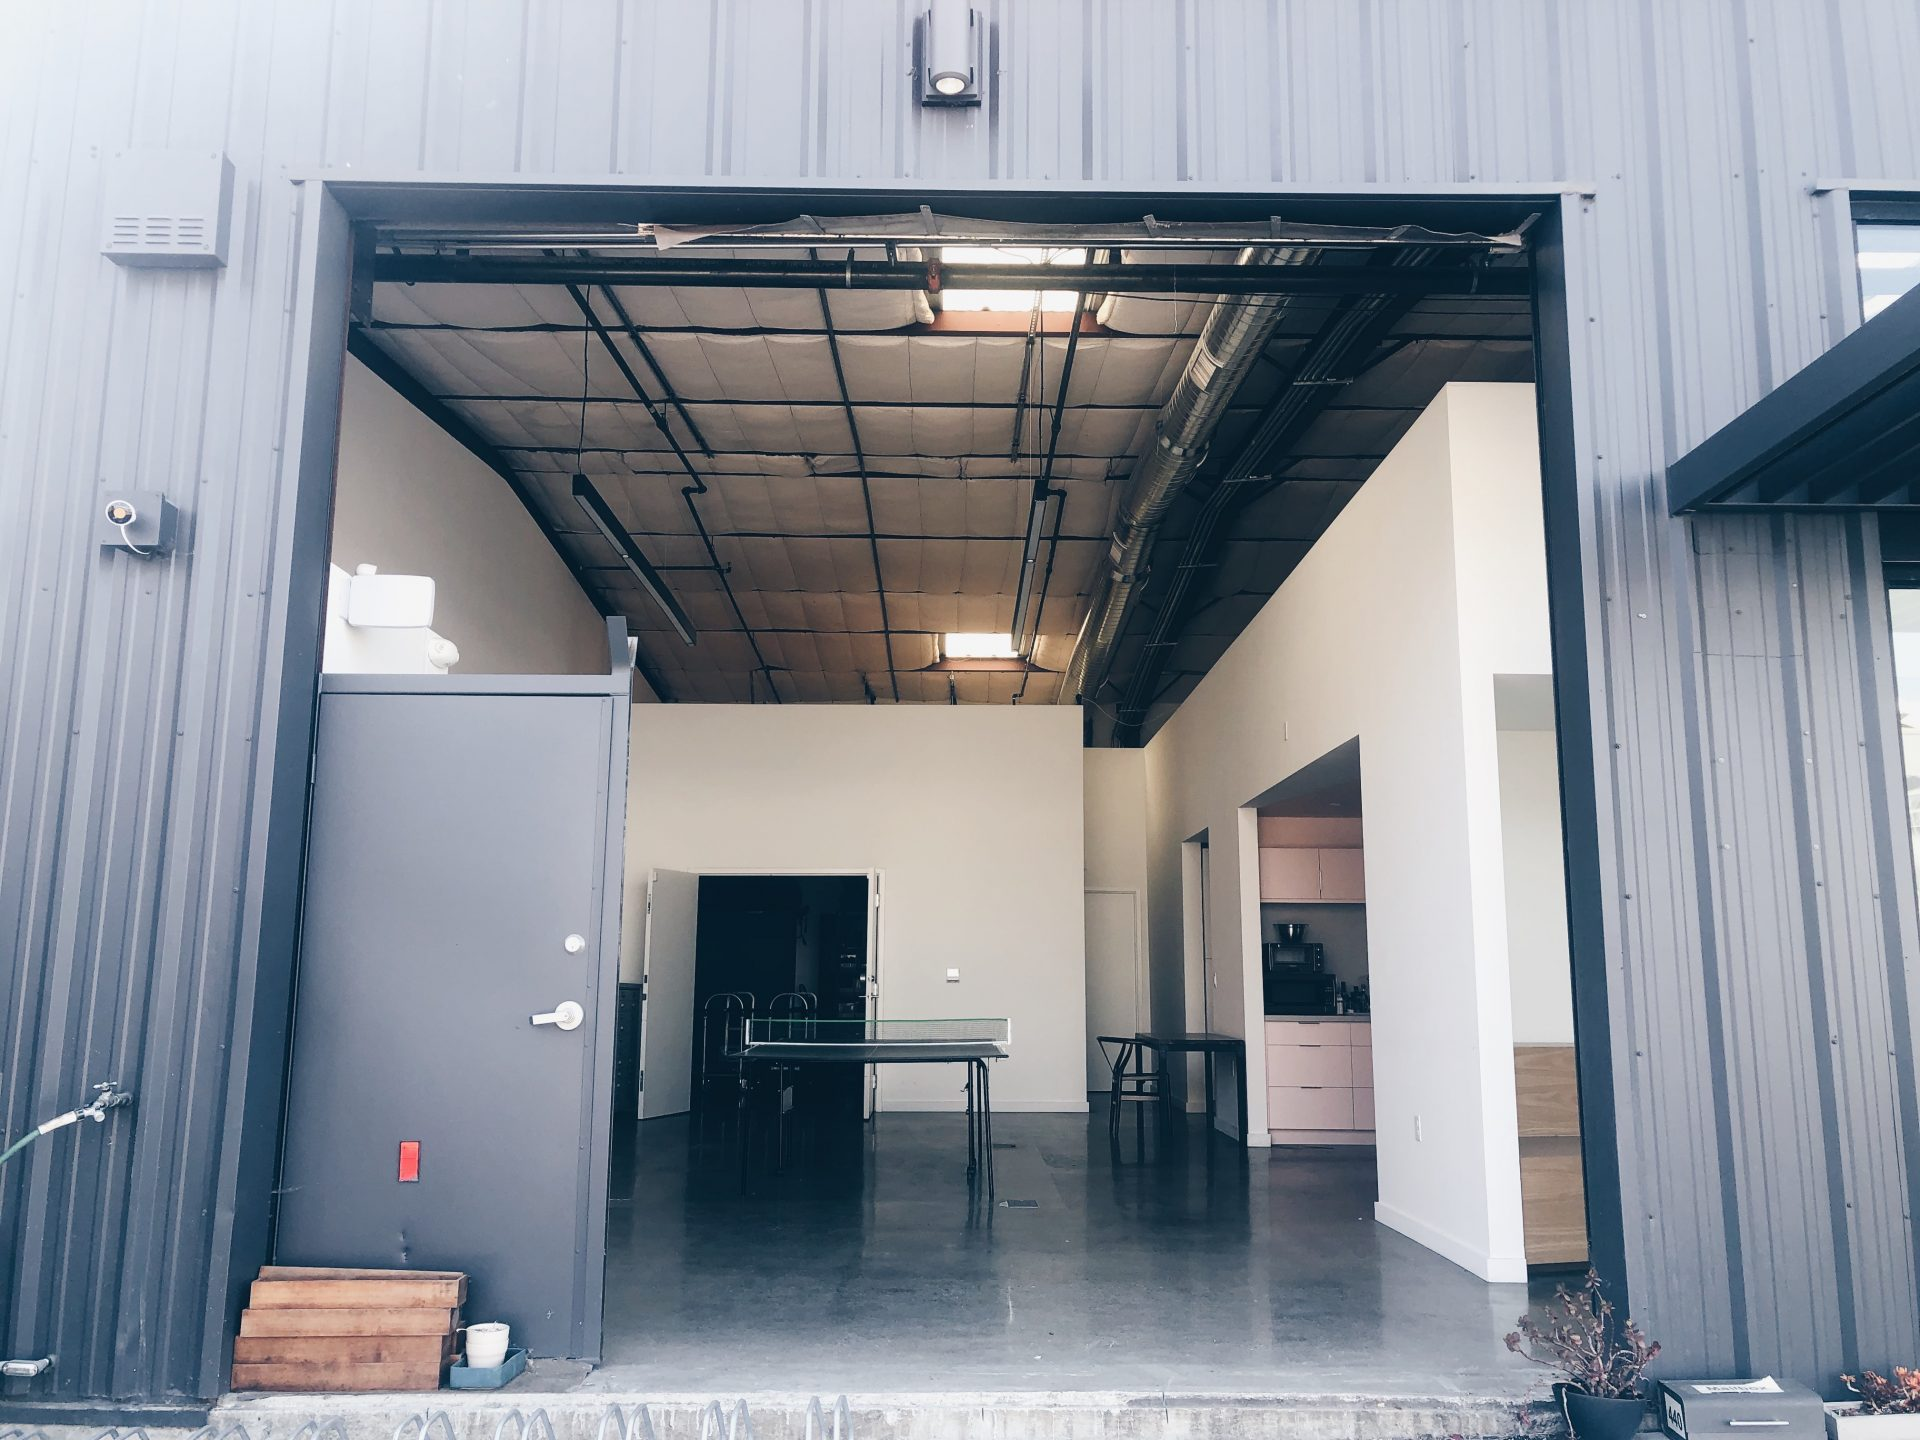 HEIST creative studio and production company